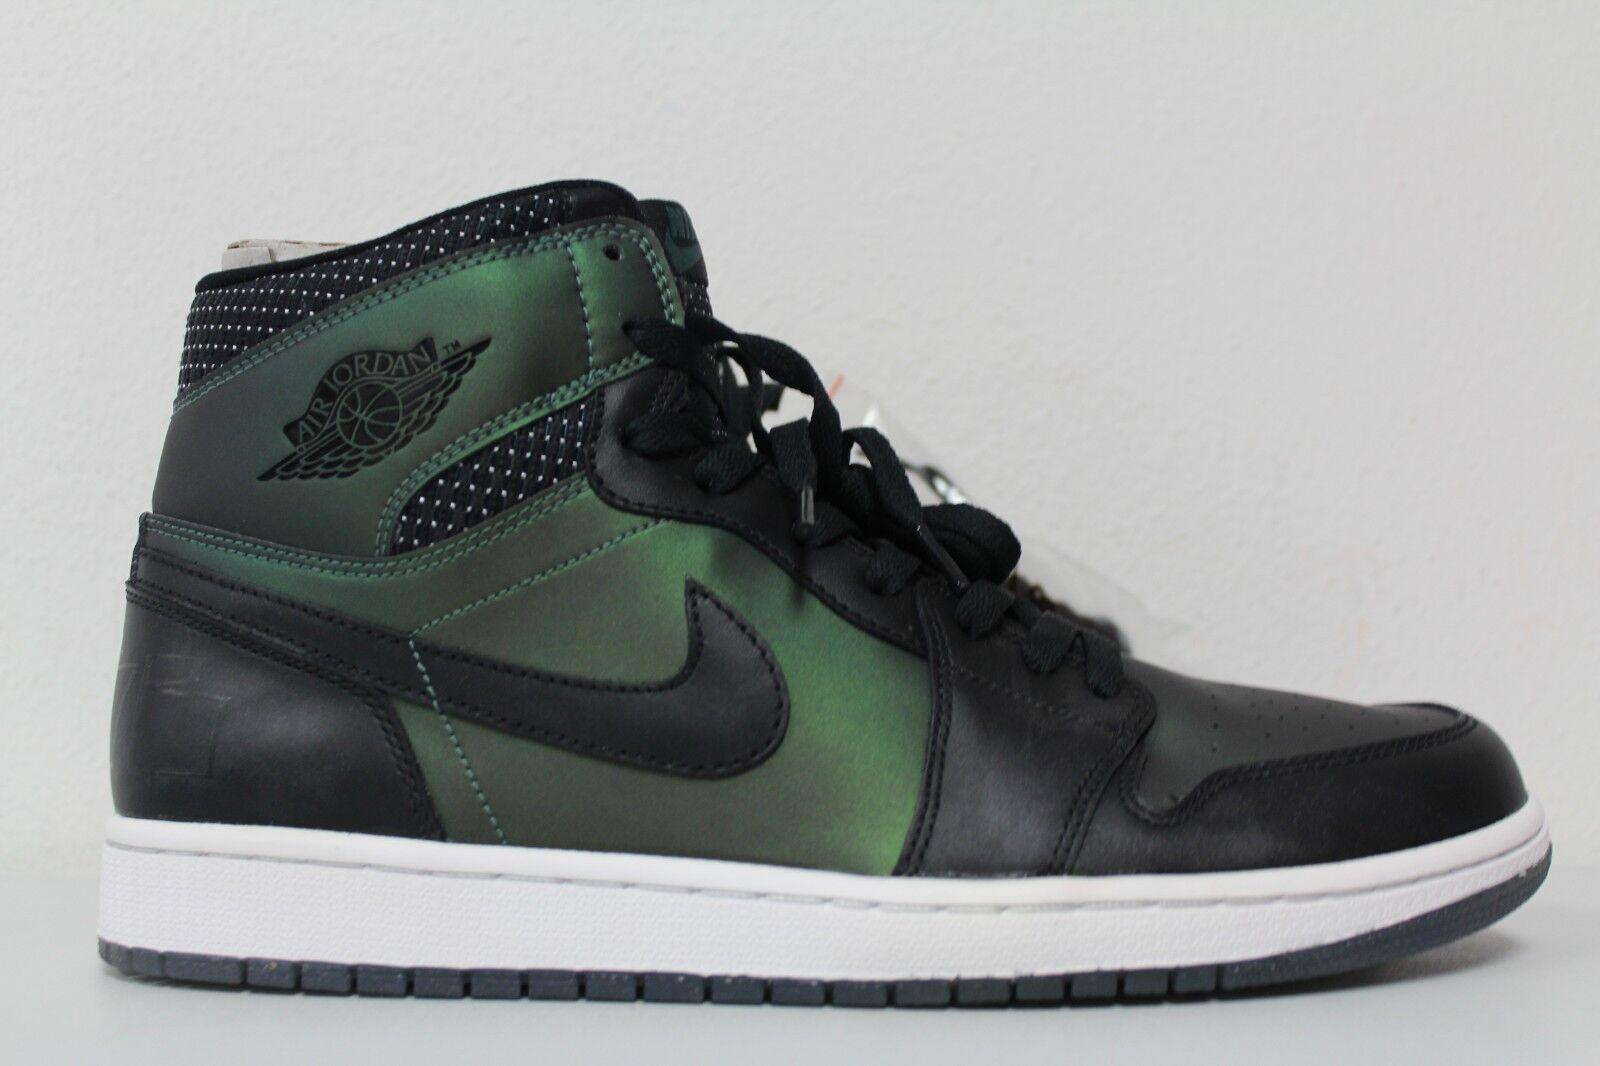 Nike Mens Air Jordan 1 Retro High x Nike SB Craig Stecyk 653532-001 Size 11.5